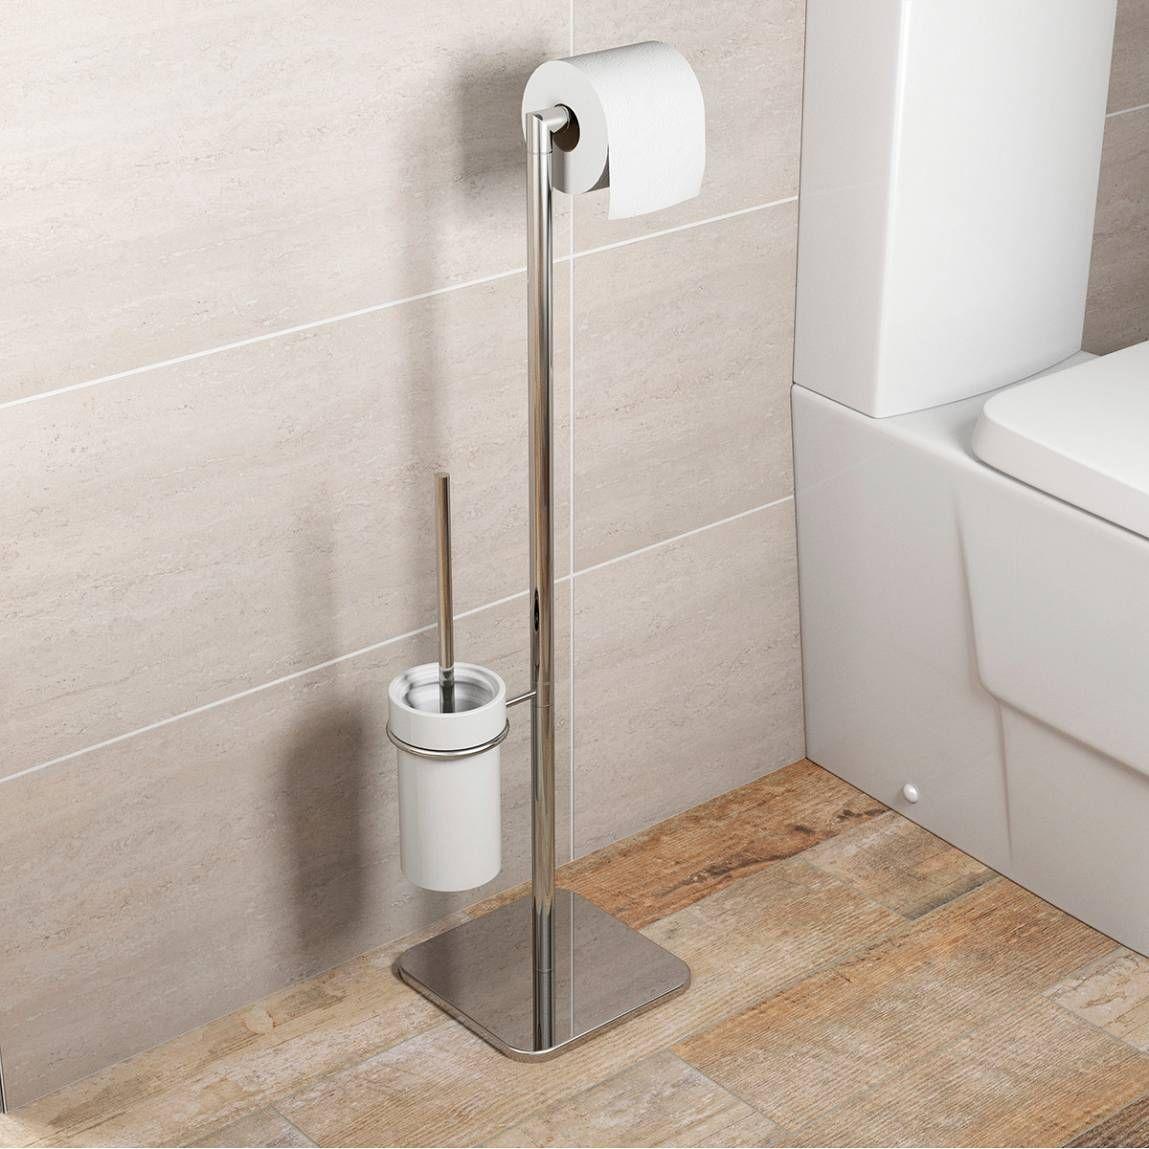 options tall freestanding toilet organiser victoria plumb - Bathroom Accessories Victoria Plumb